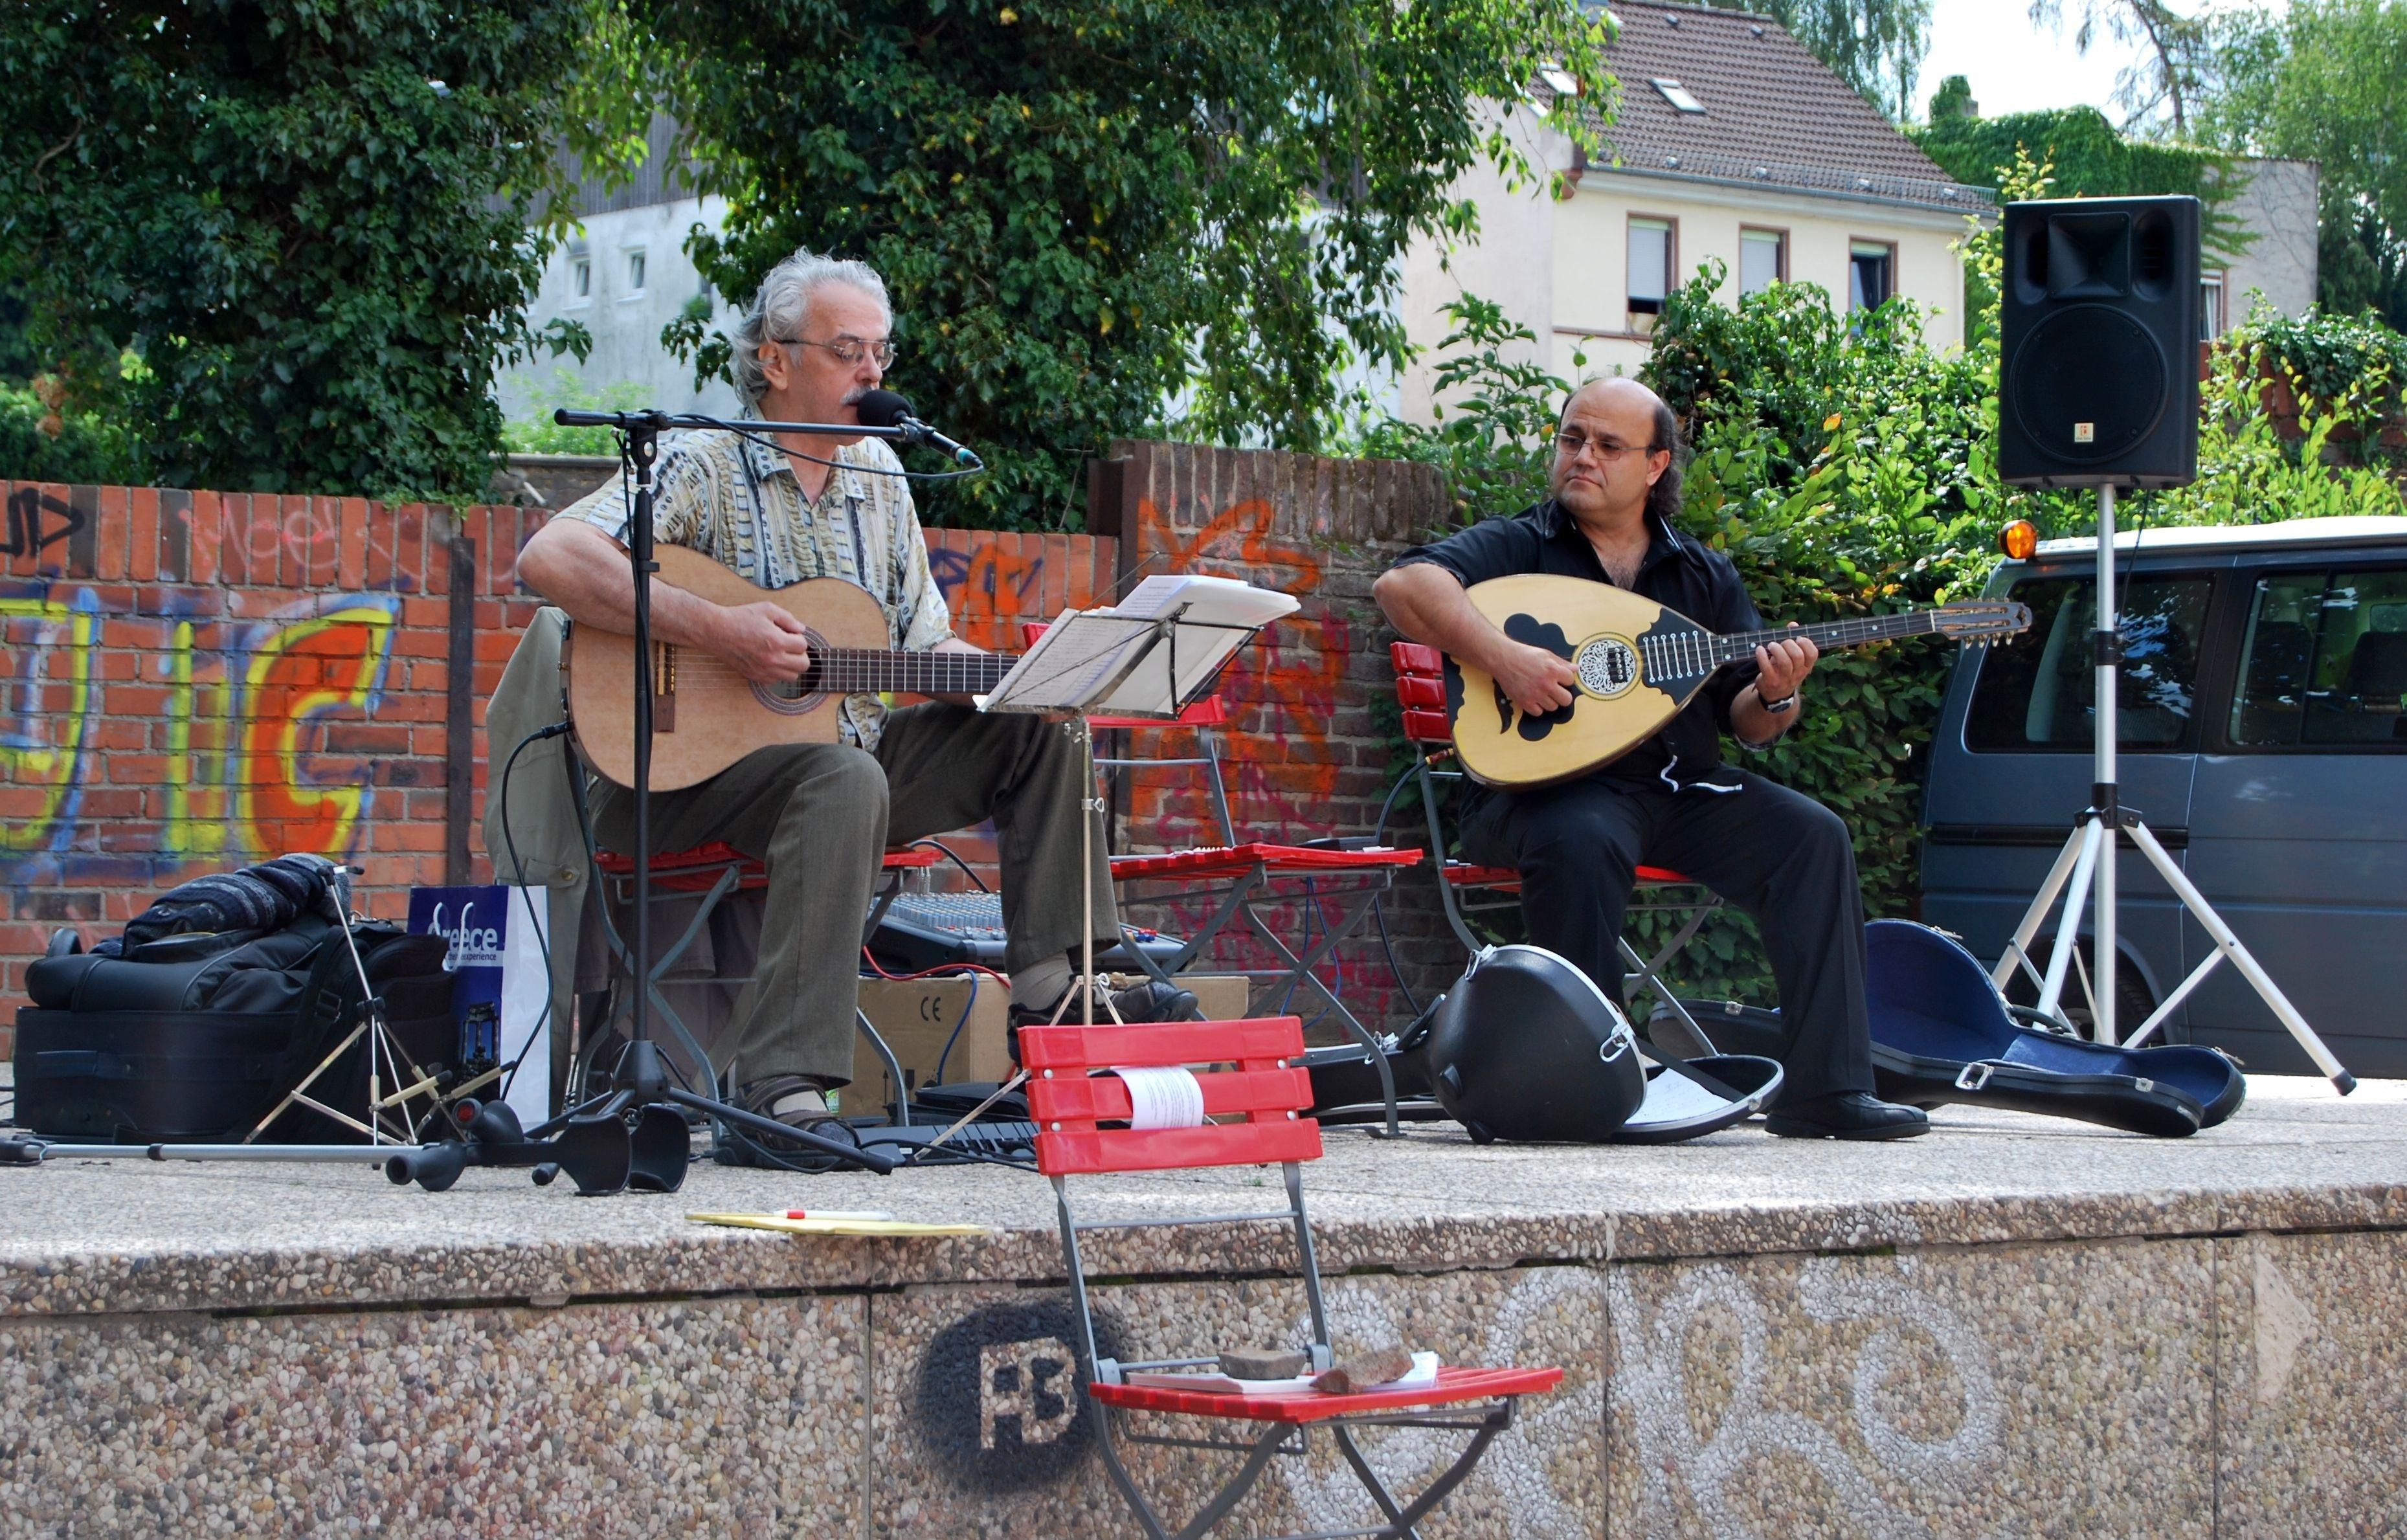 1. Festival der interkulturellen Musik